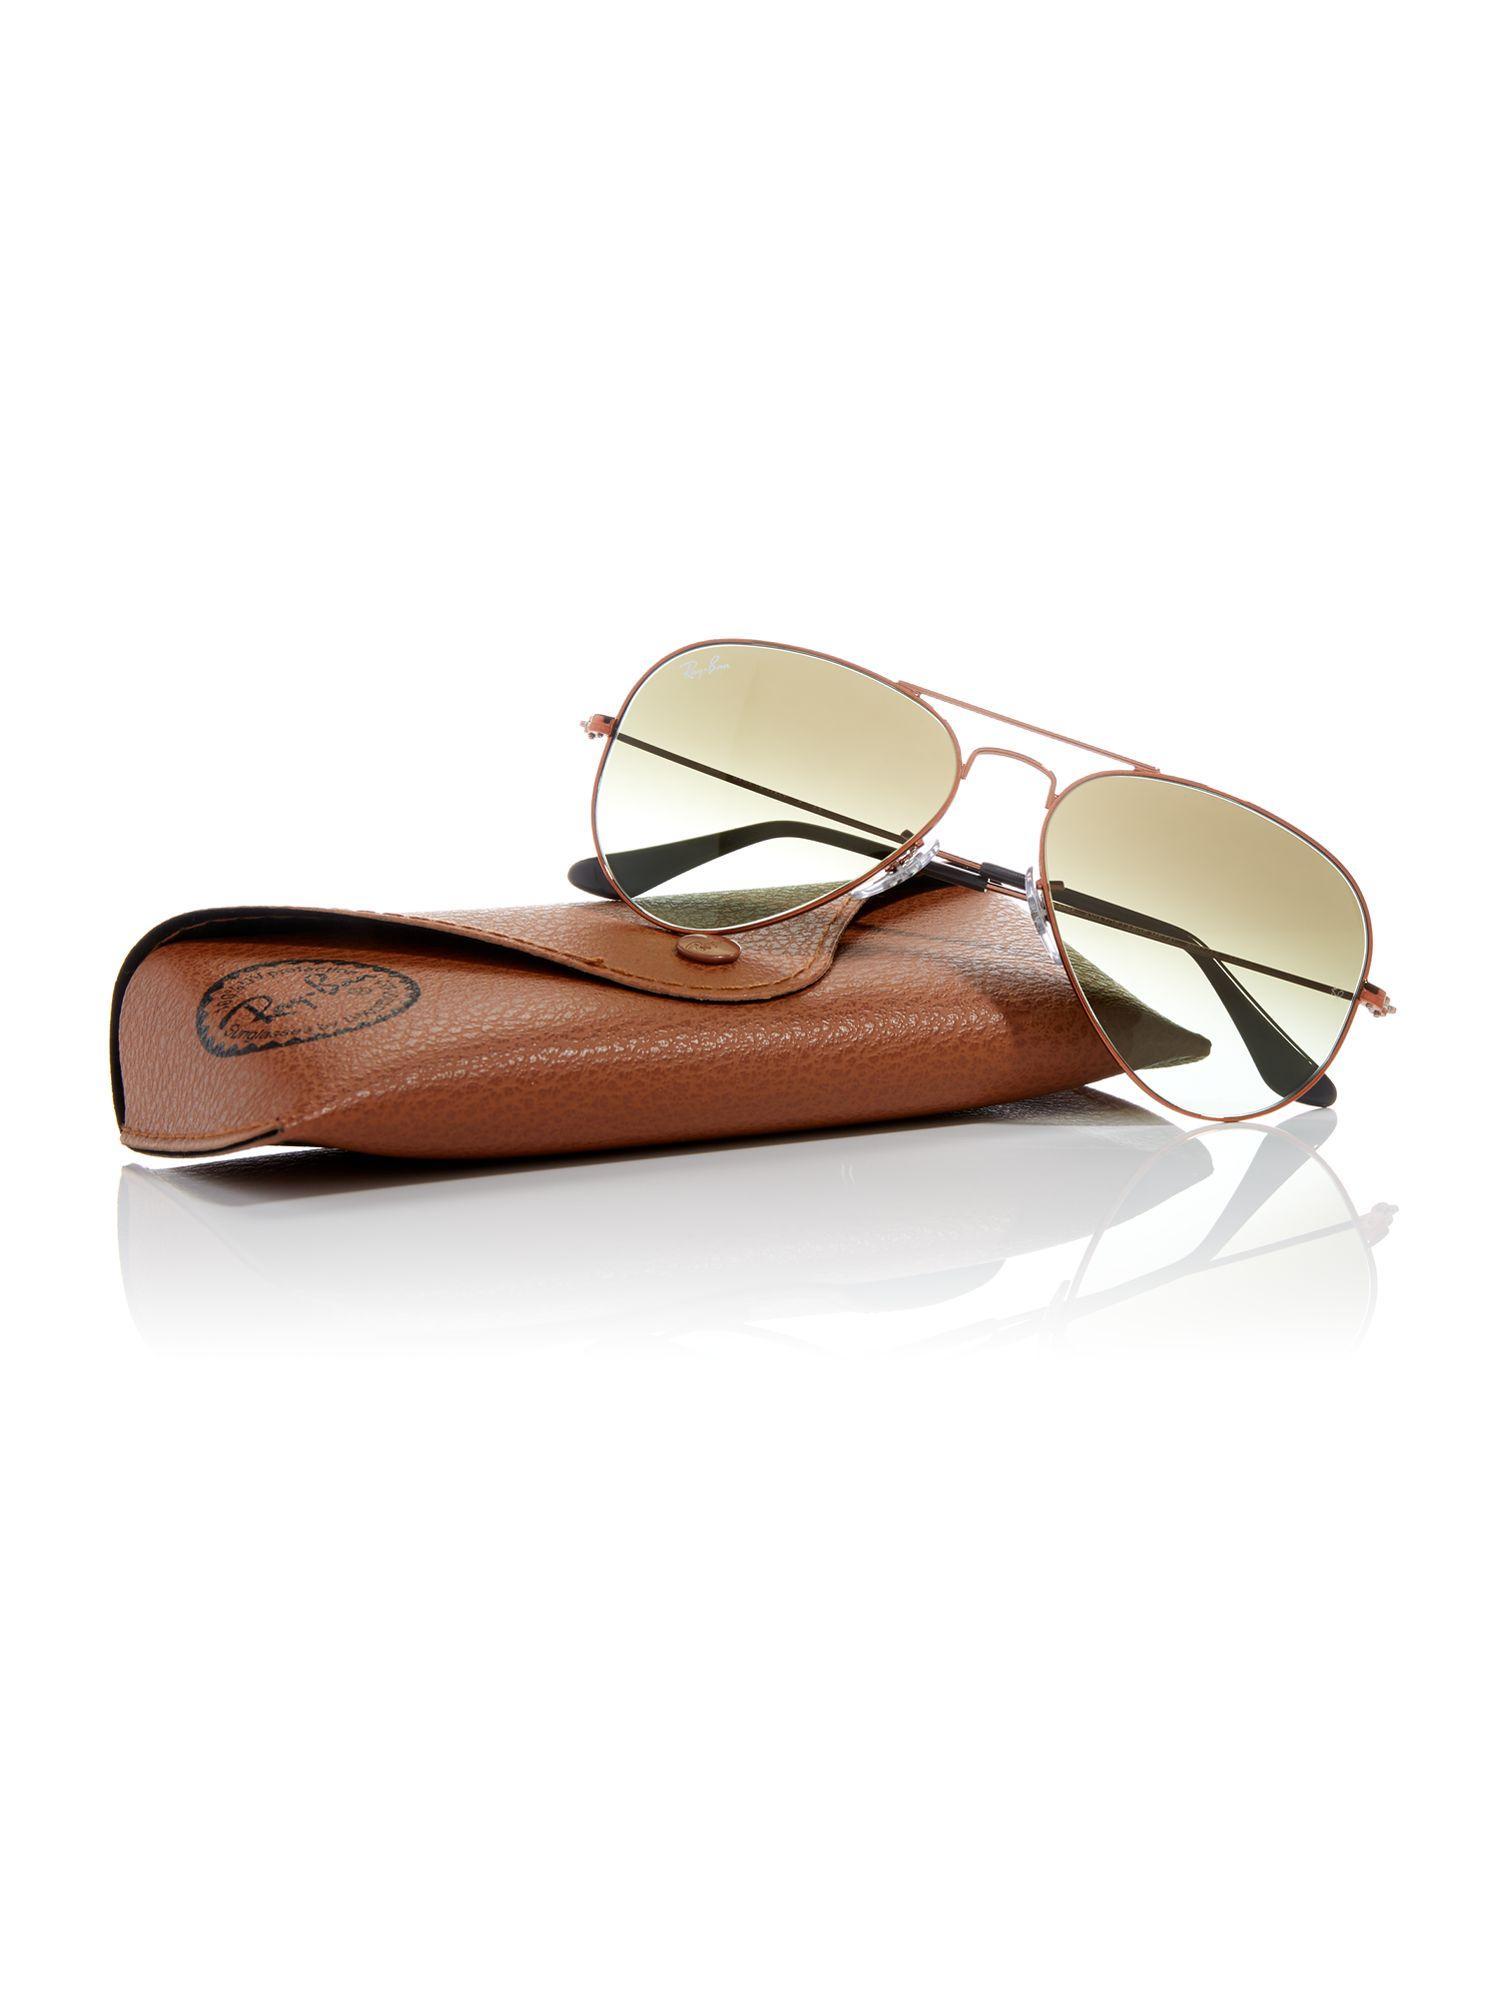 Ray-Ban Bronze Rb3025 Aviator Pilot Sunglasses for Men